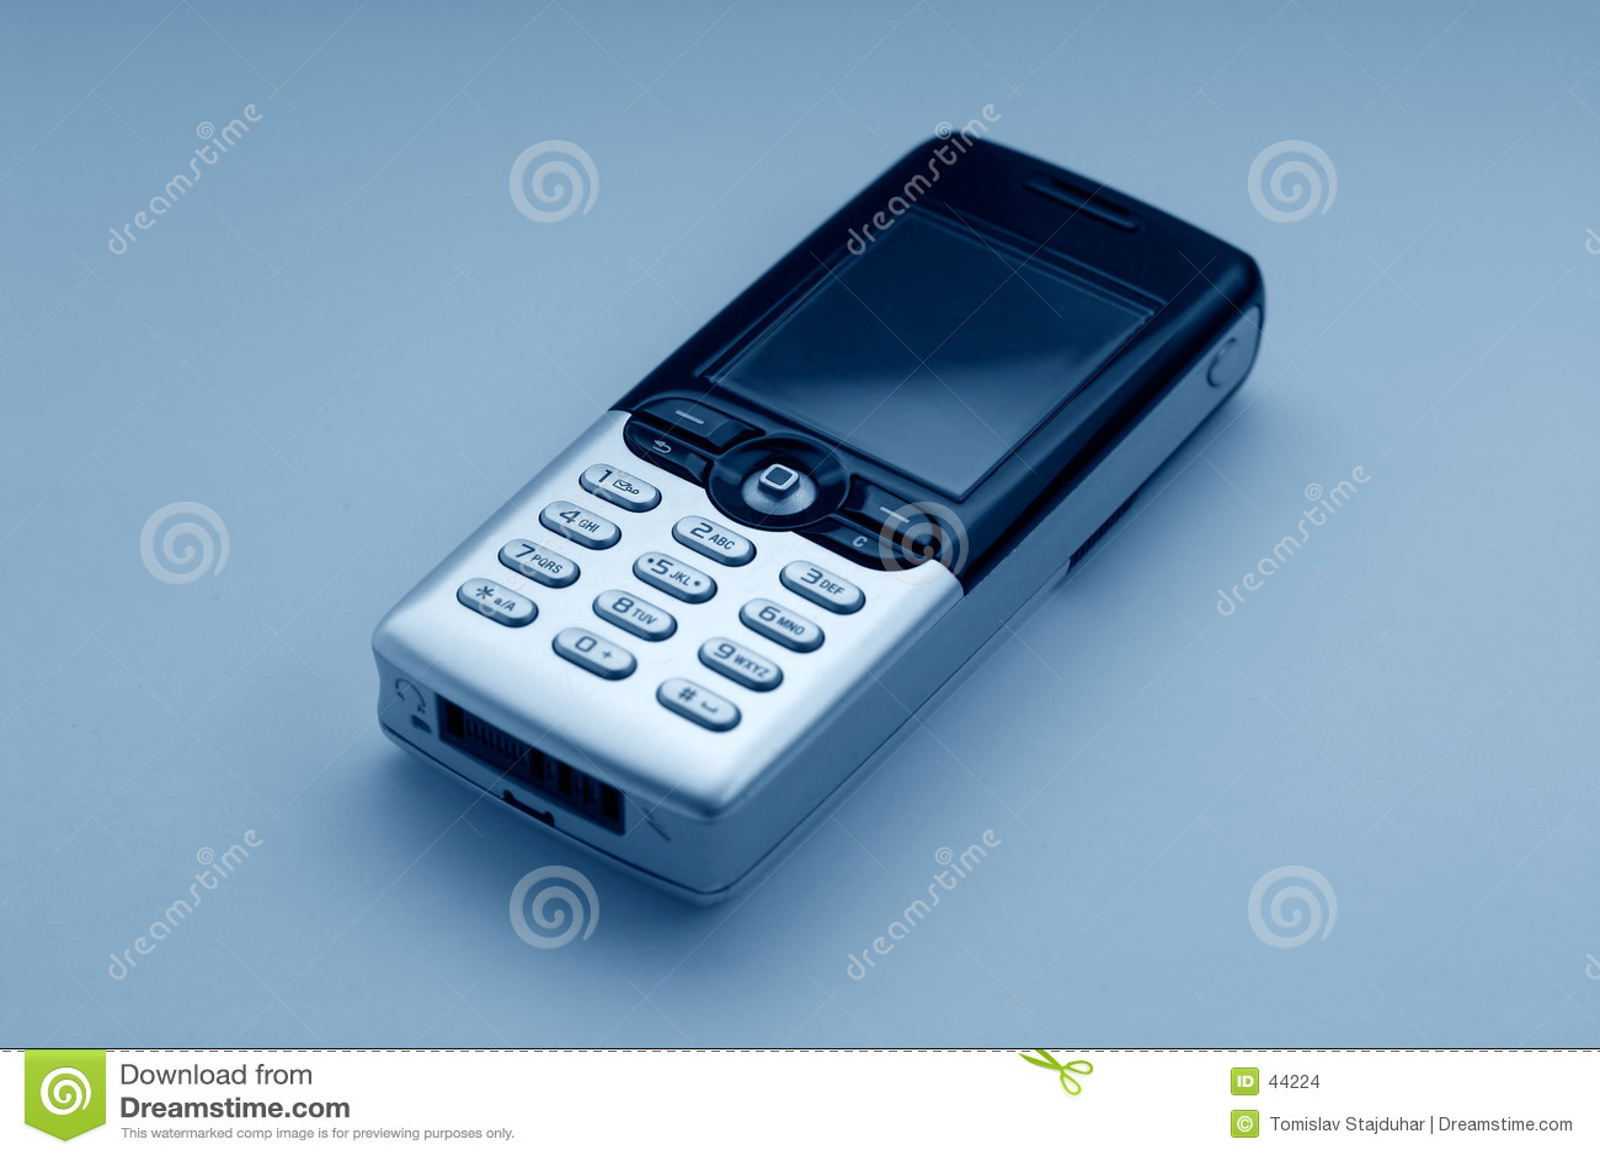 Mobiele telefoon - blauwe toon